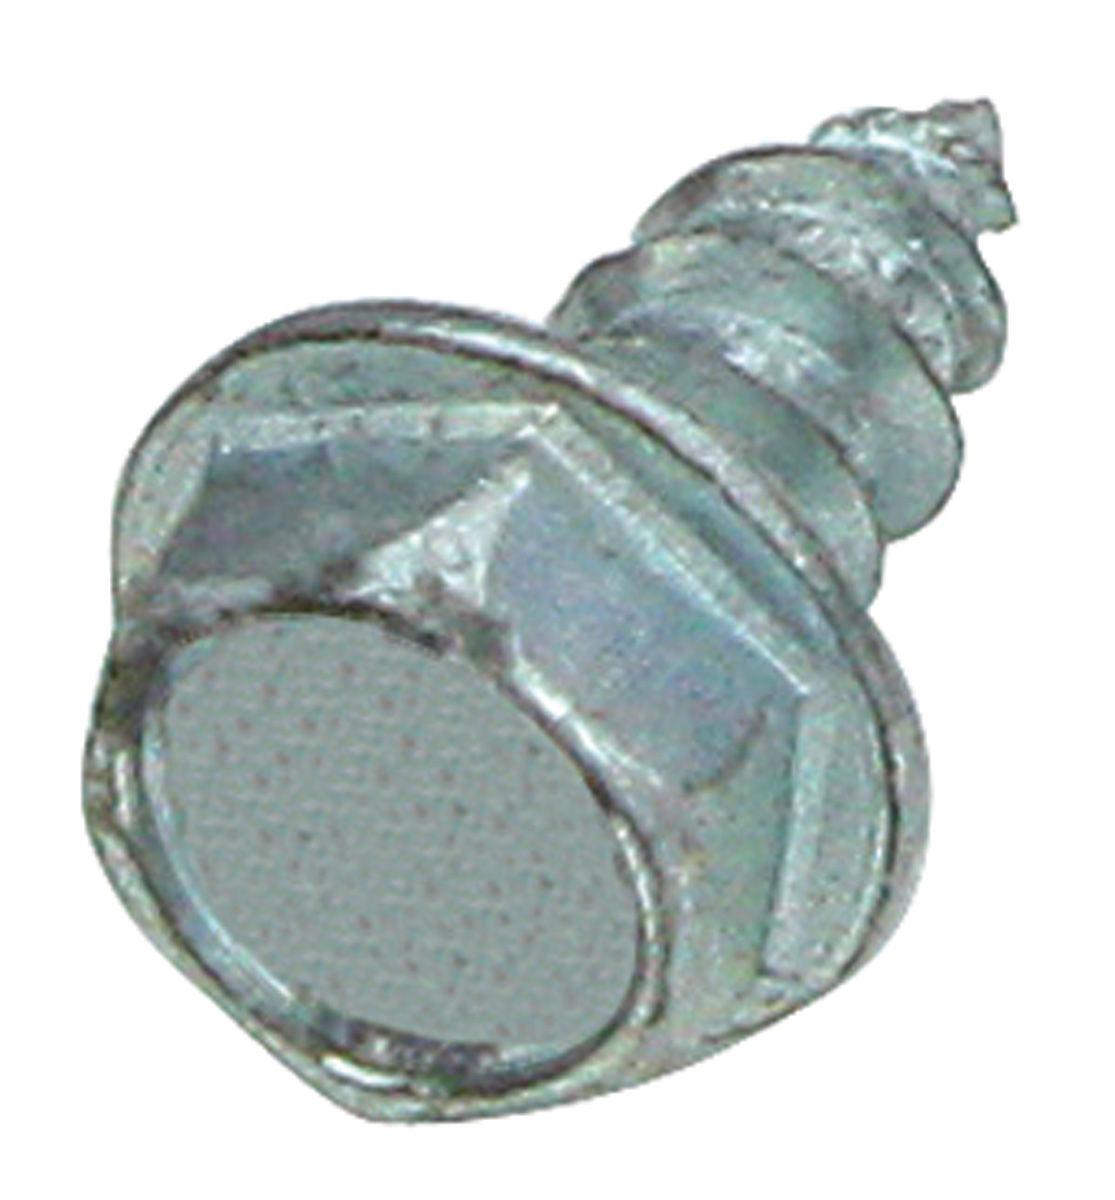 Photo of Ignition Switch Screw